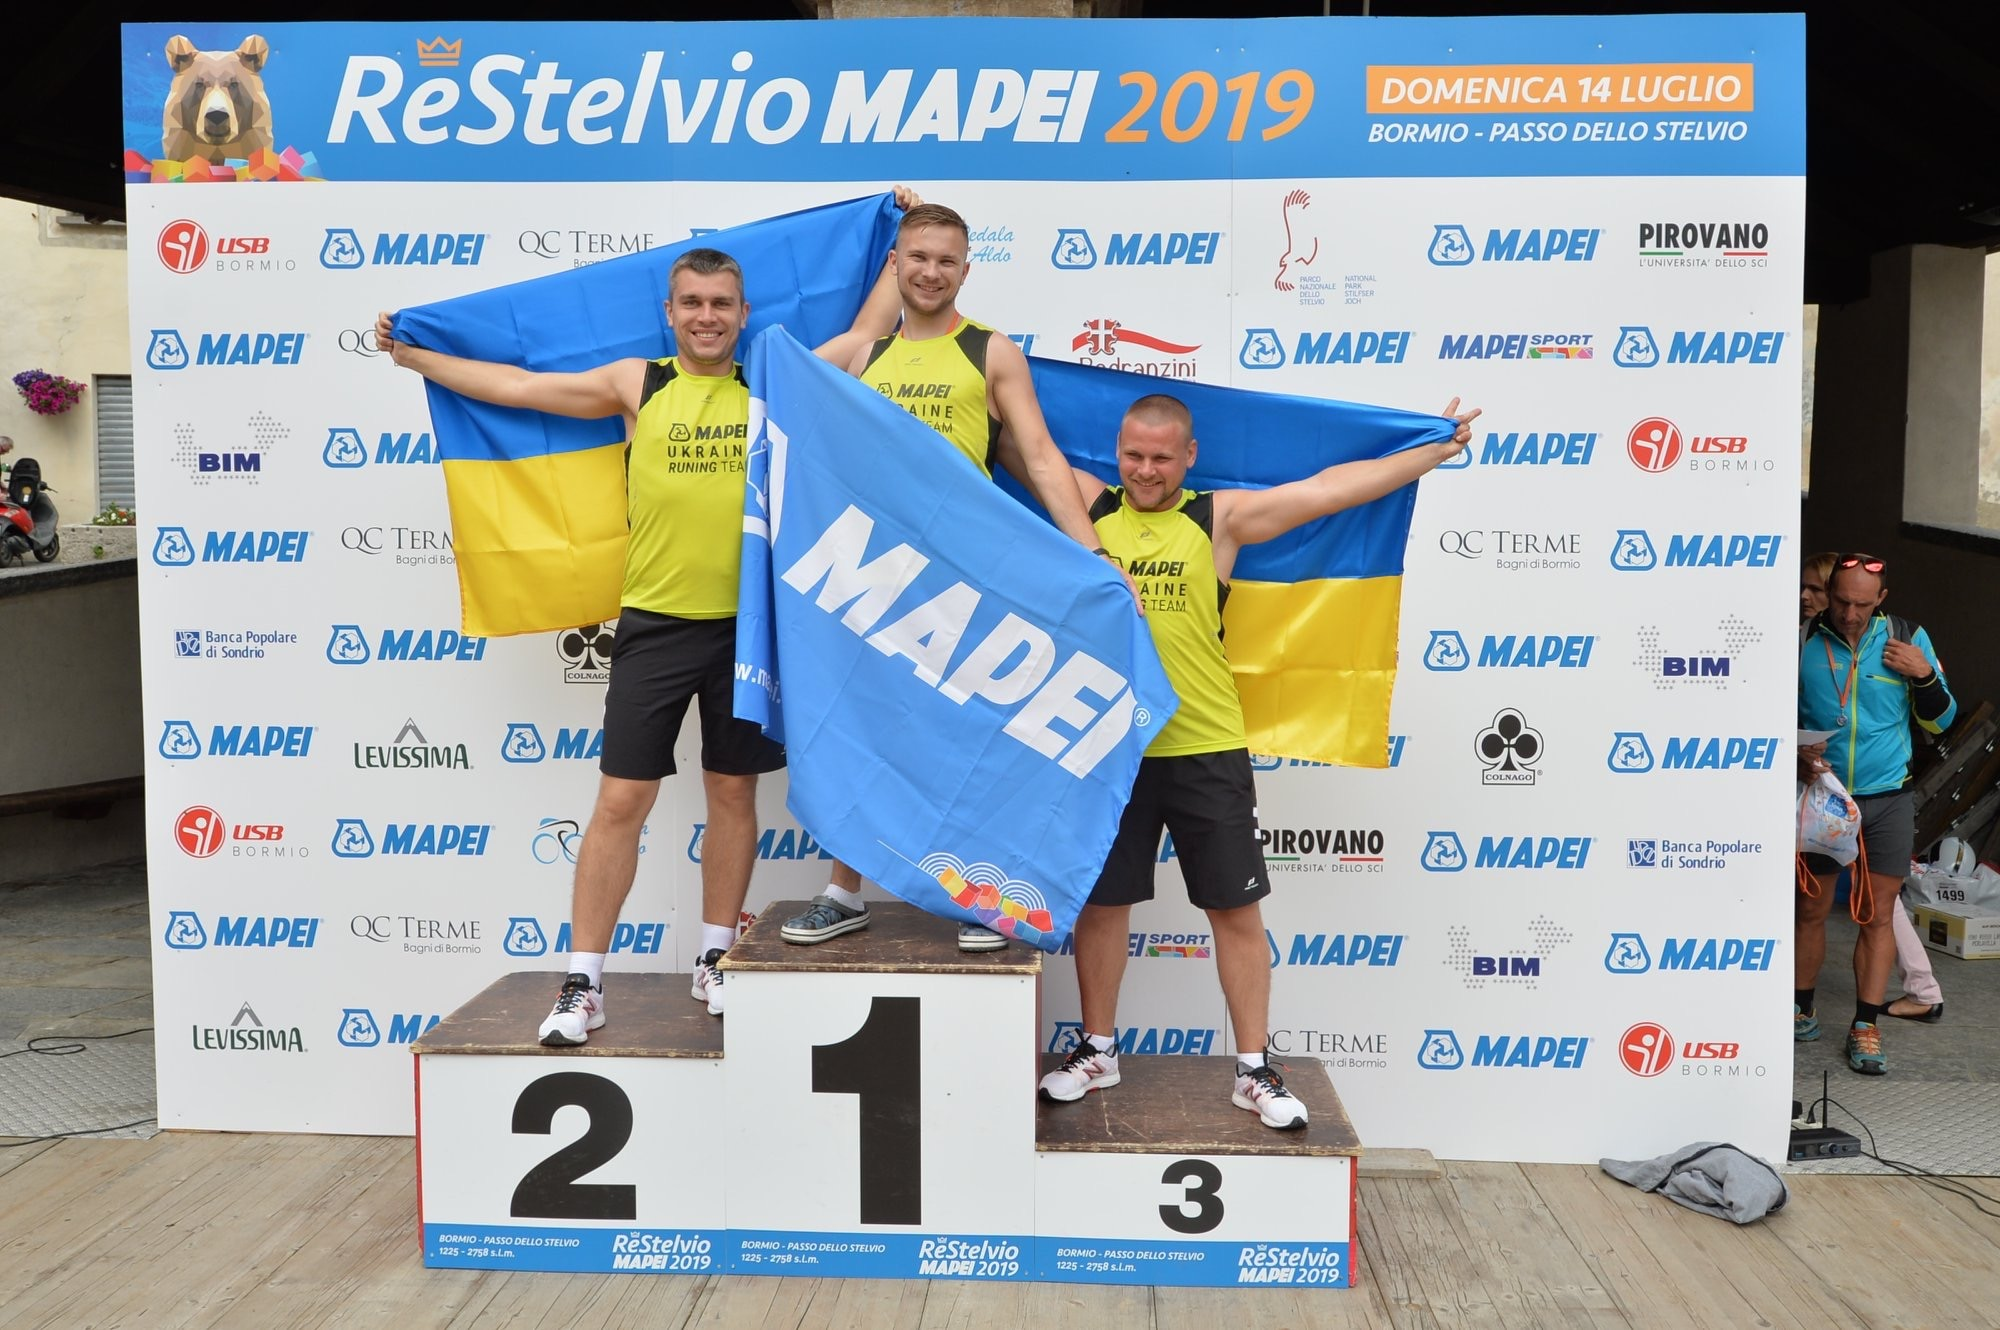 Напівмарафон Re Stelvio Mapei 2019